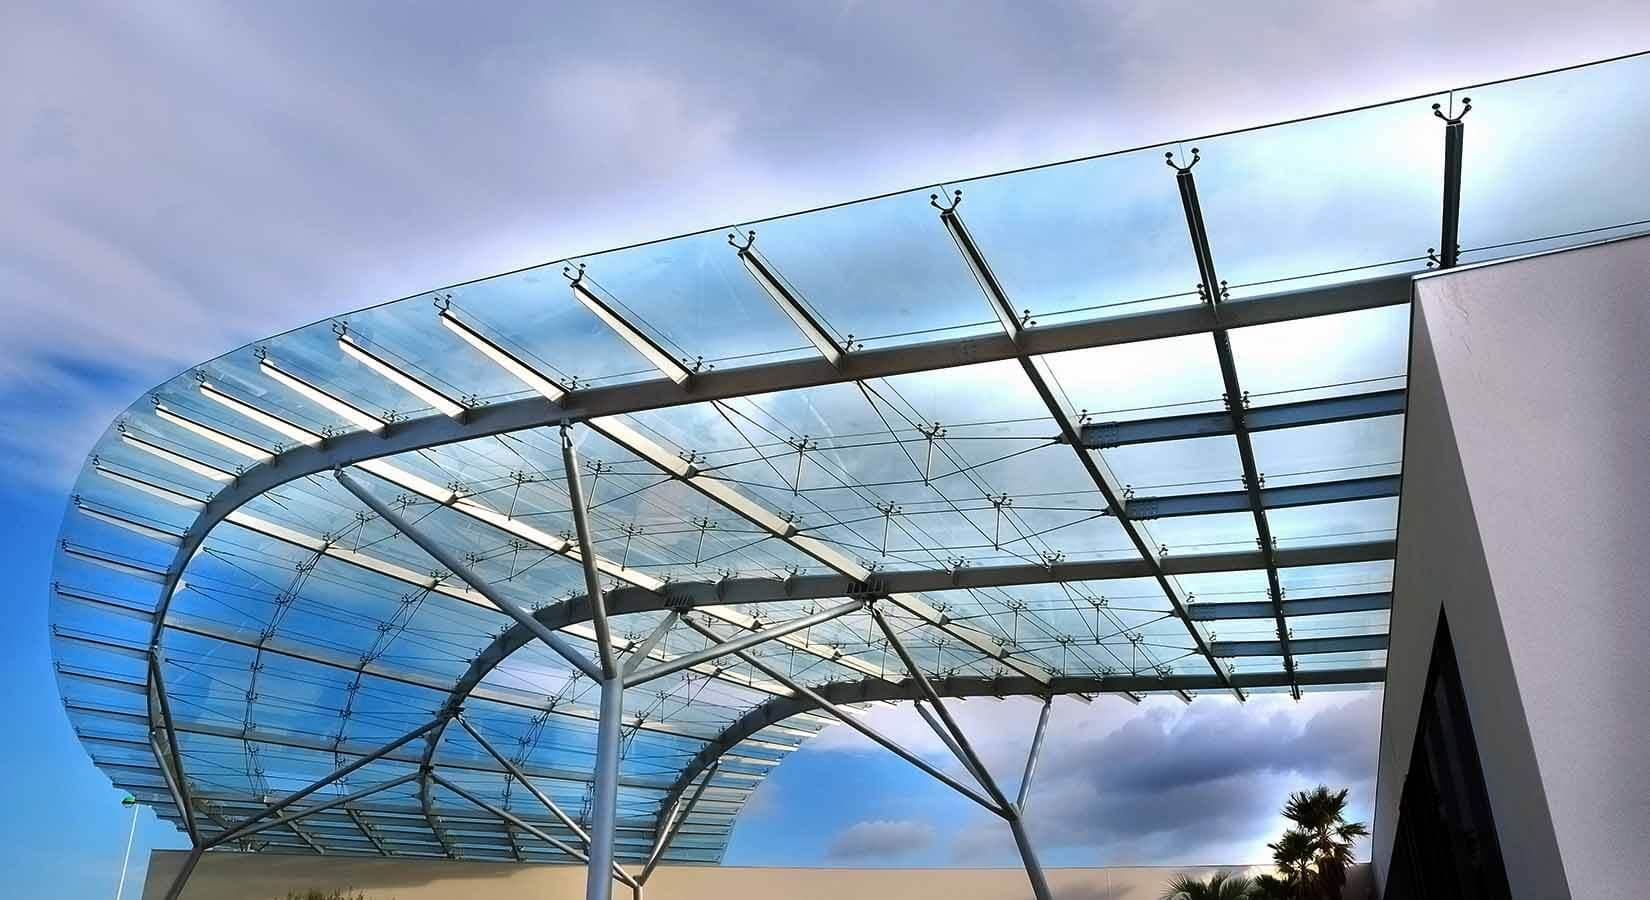 ozone australia - Spider Glazing - Ozone Hardware Australia